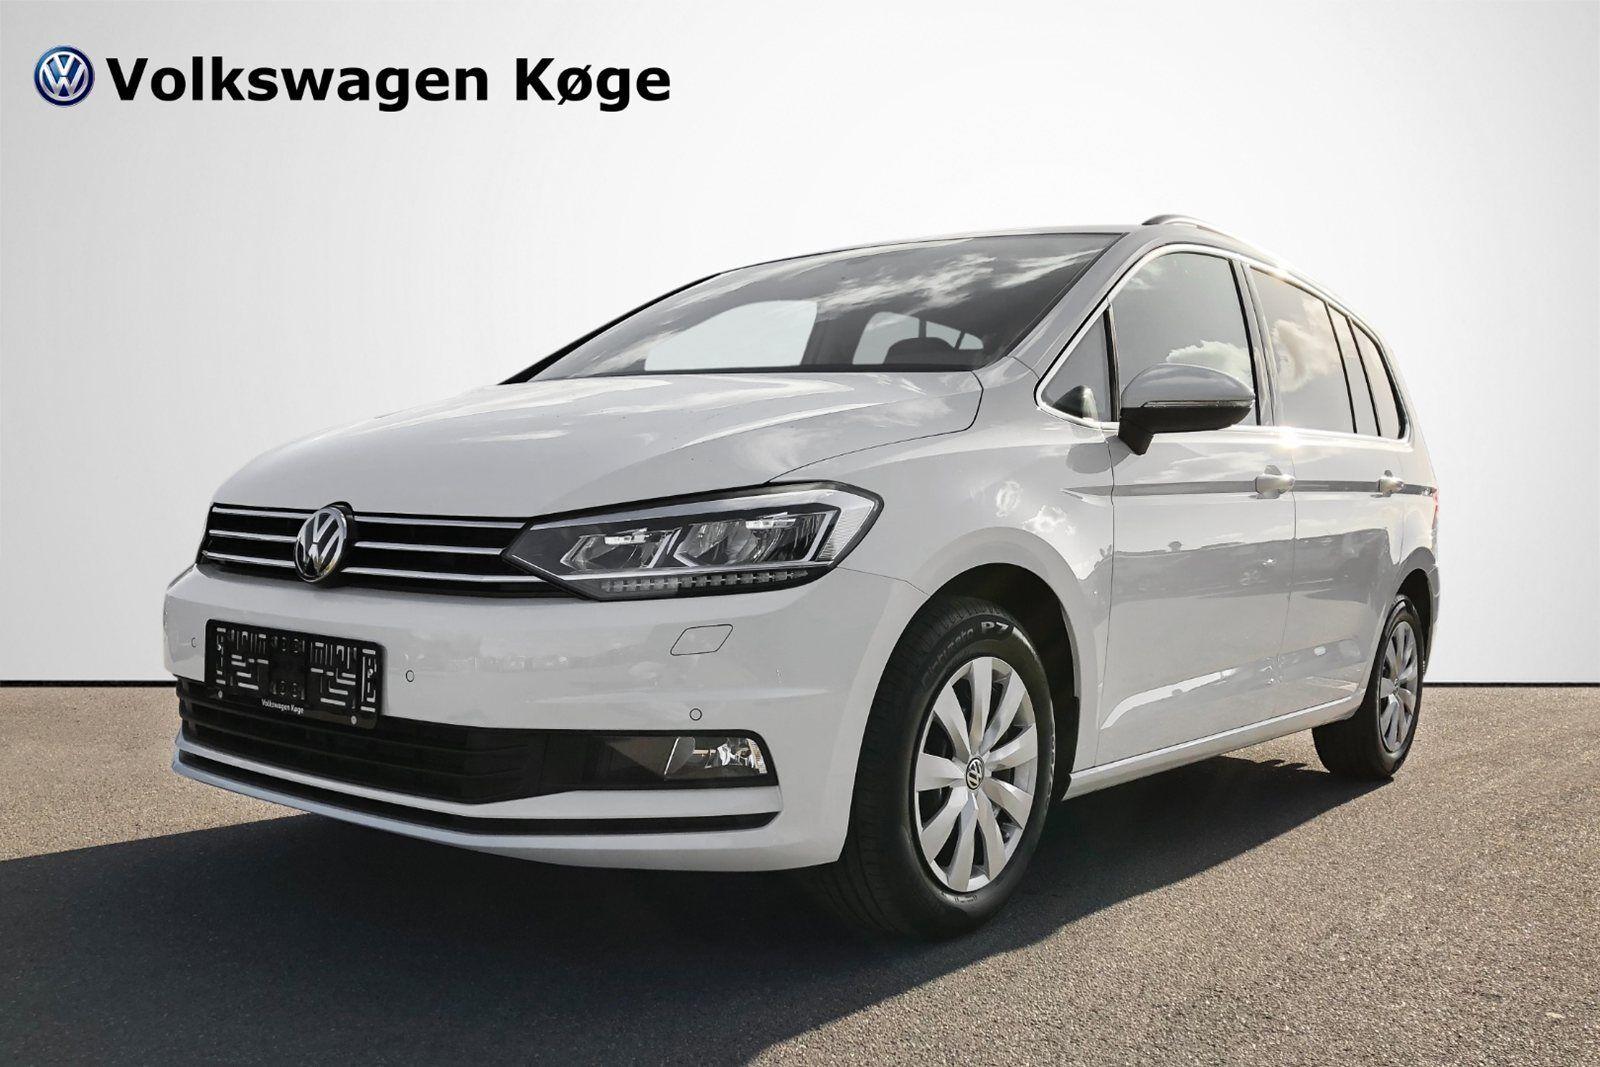 VW Touran 1,4 TSi 150 Comfortline DSG BMT 5d - 339.900 kr.